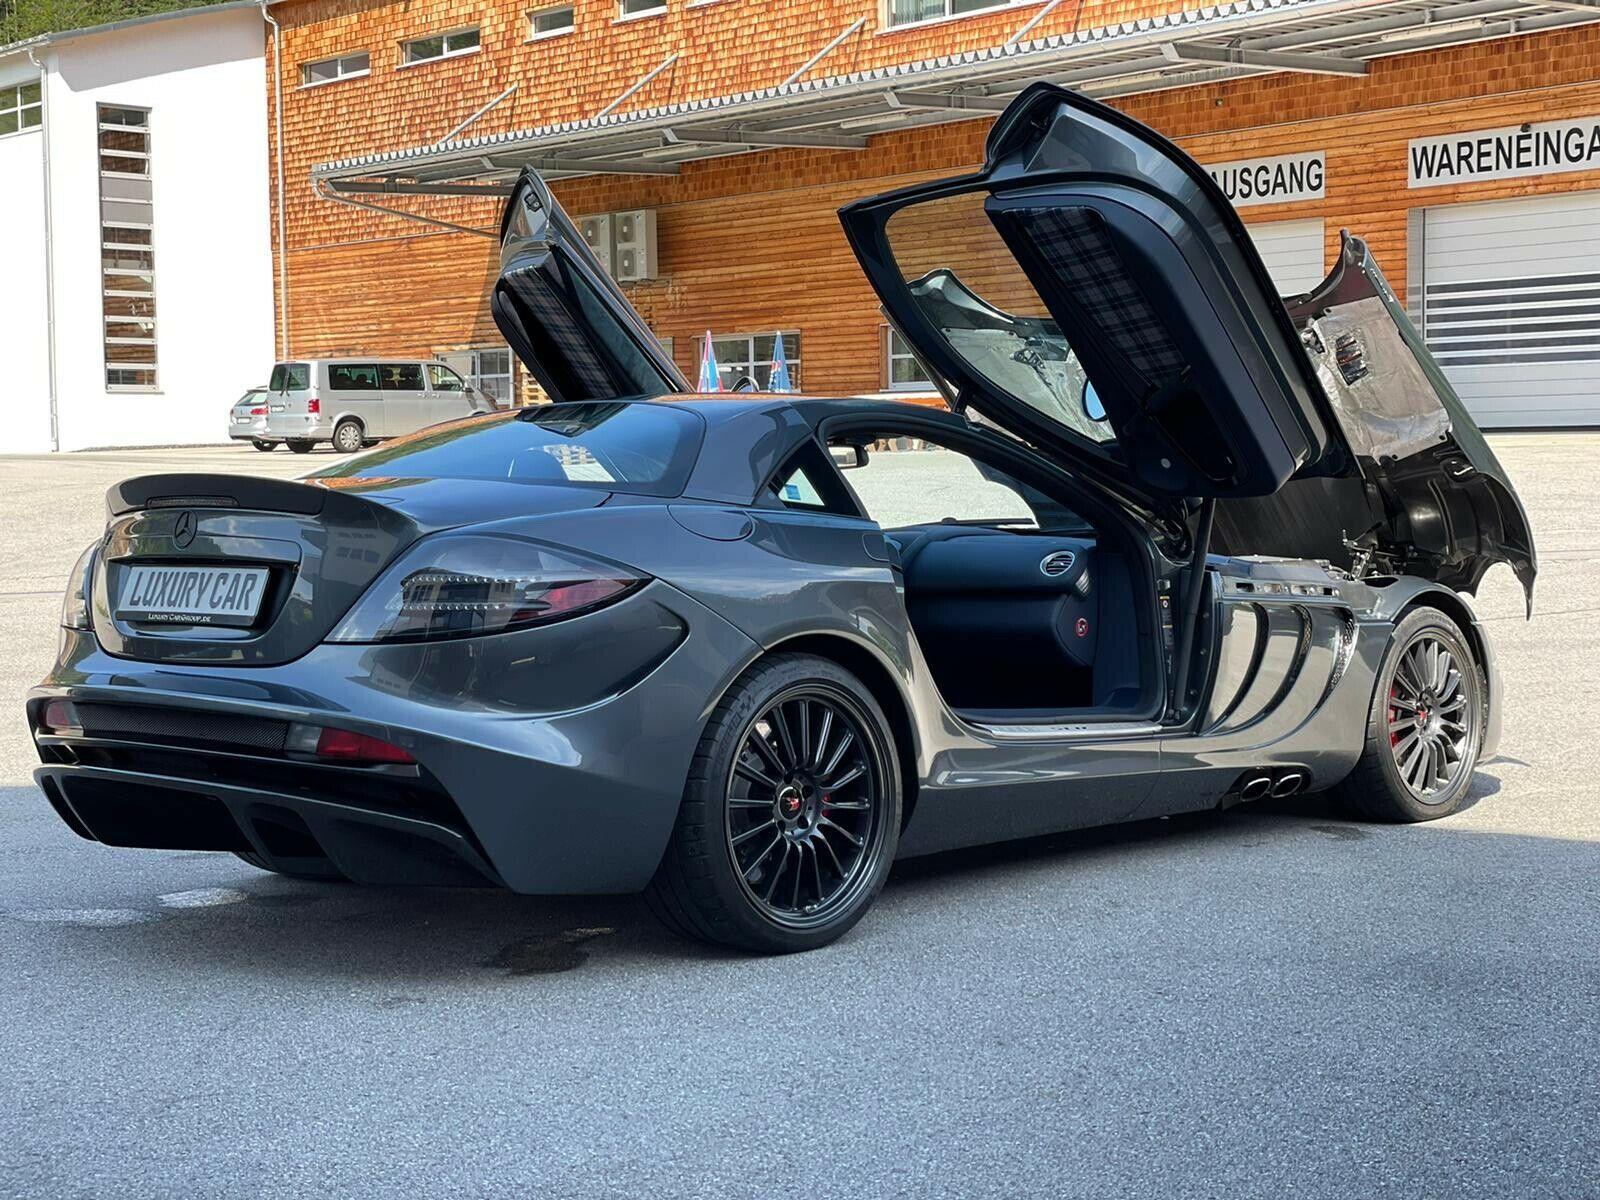 SLR McLaren Edition for Sale